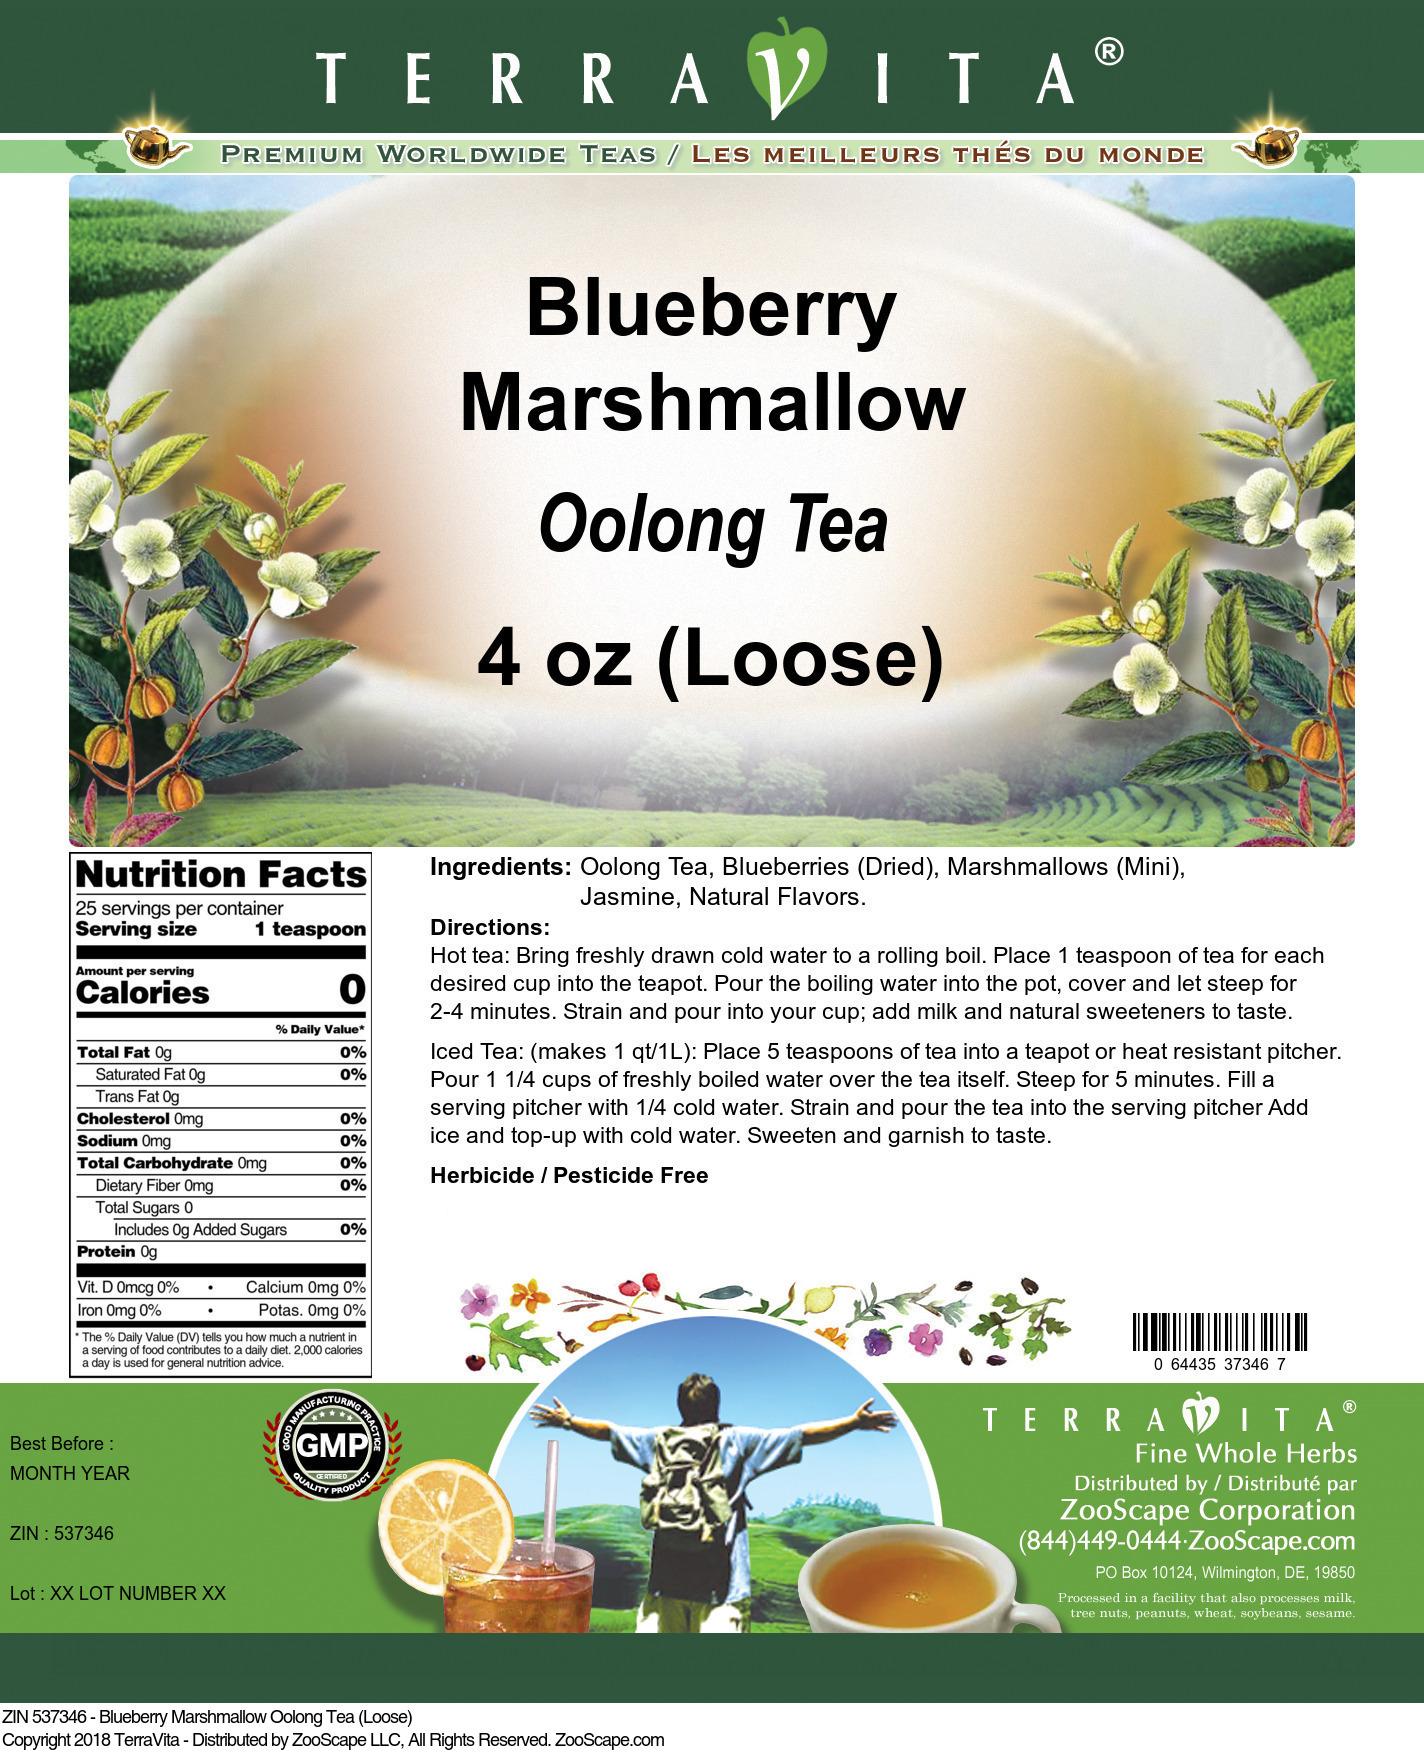 Blueberry Marshmallow Oolong Tea (Loose)